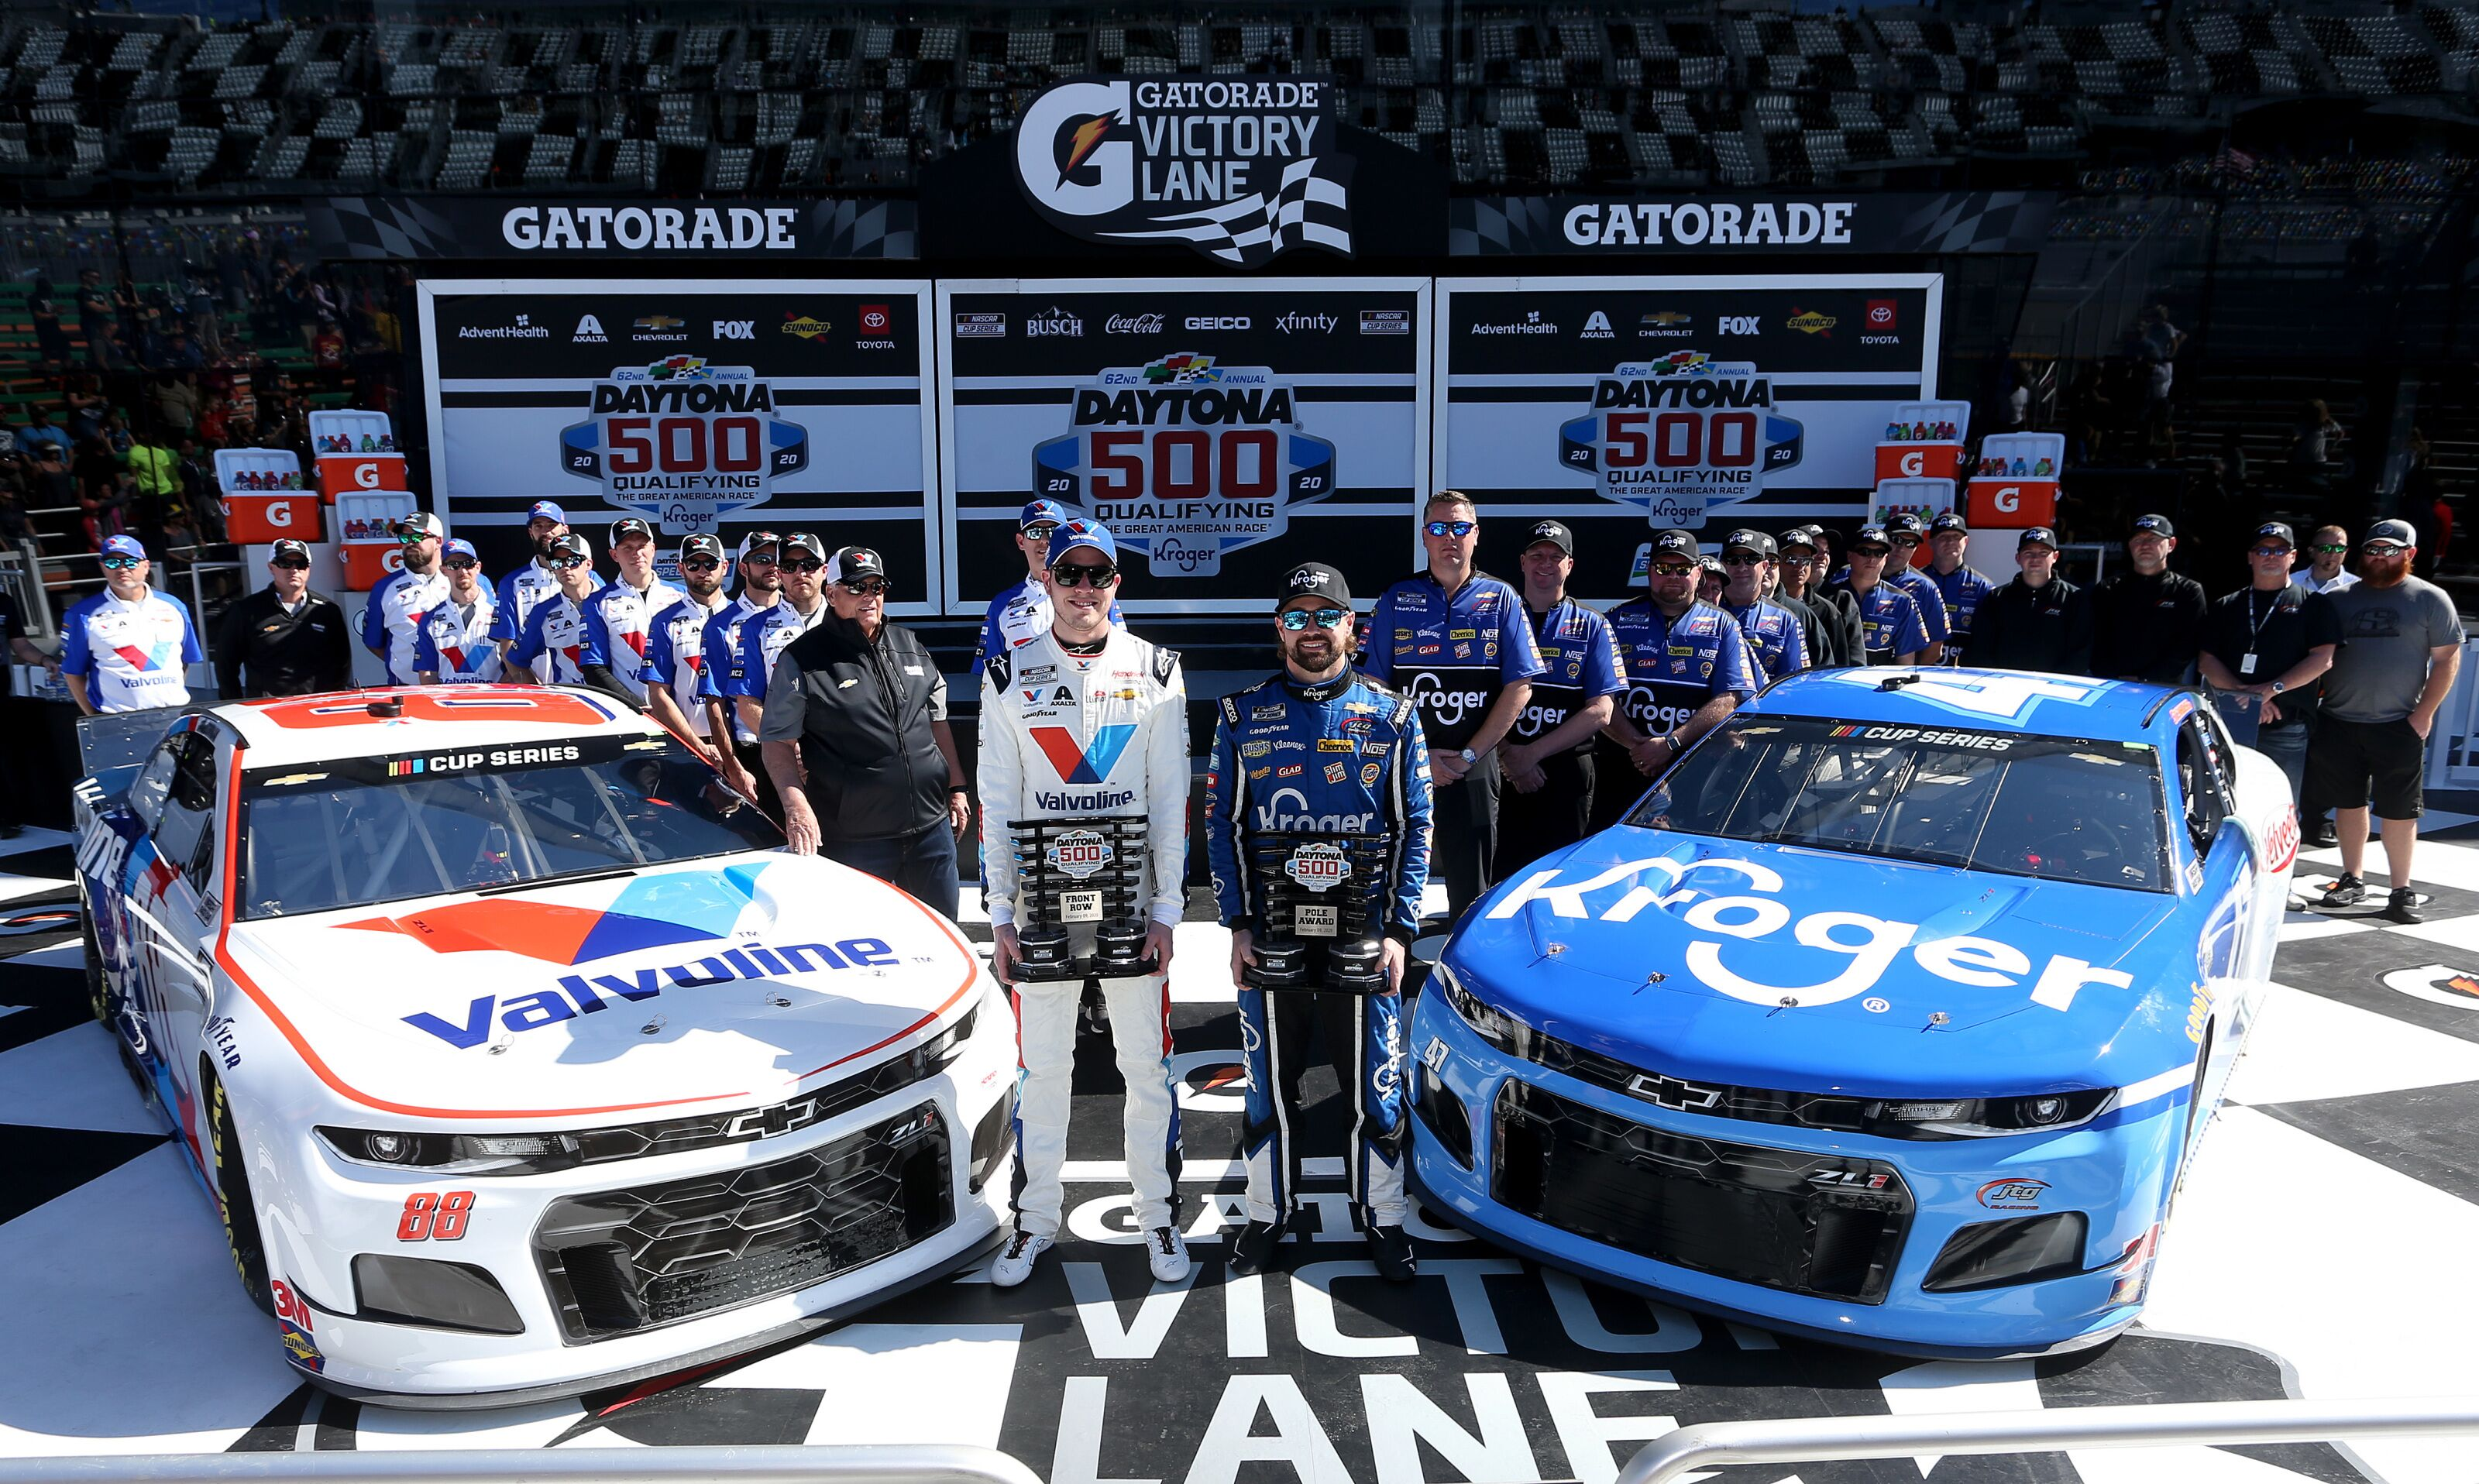 NASCAR: 38 cars failed Daytona 500 pre-qualifying inspection – Beyond the Flag